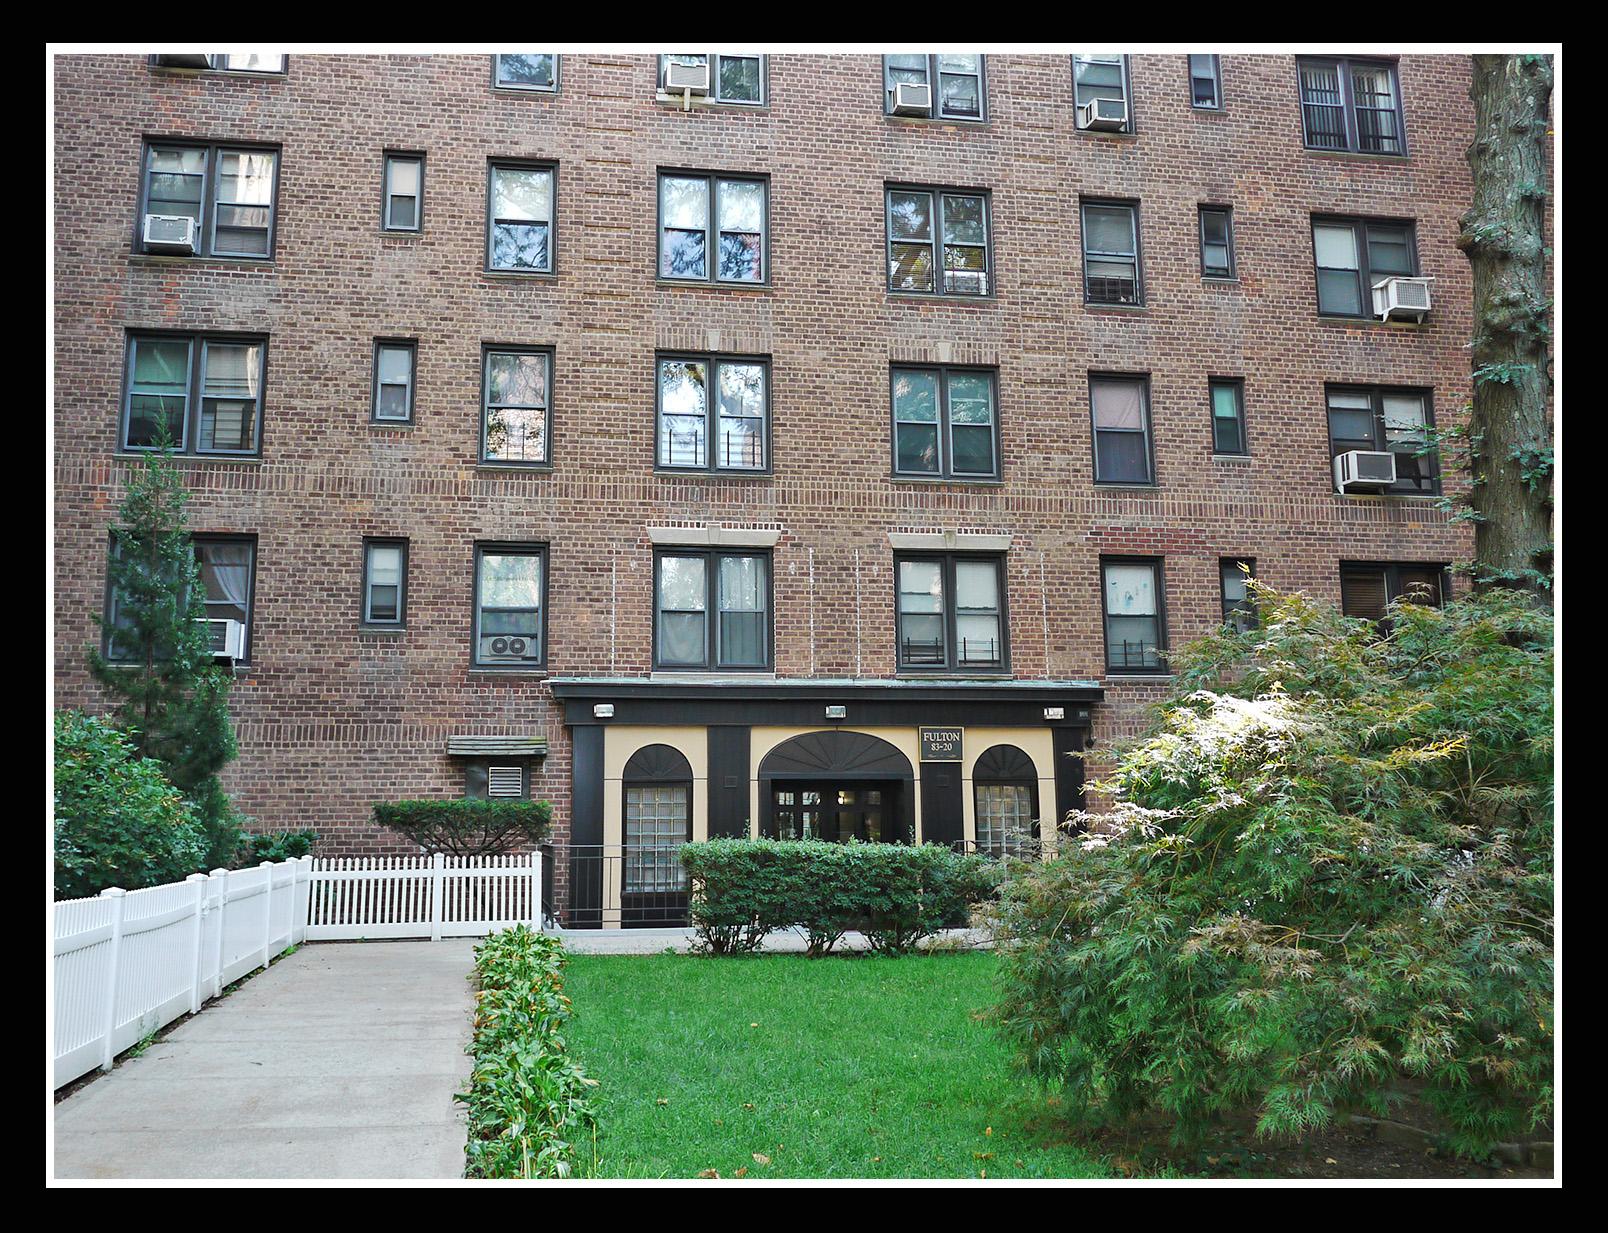 83-20 98 ST #3B, Woodhaven, NY 11421